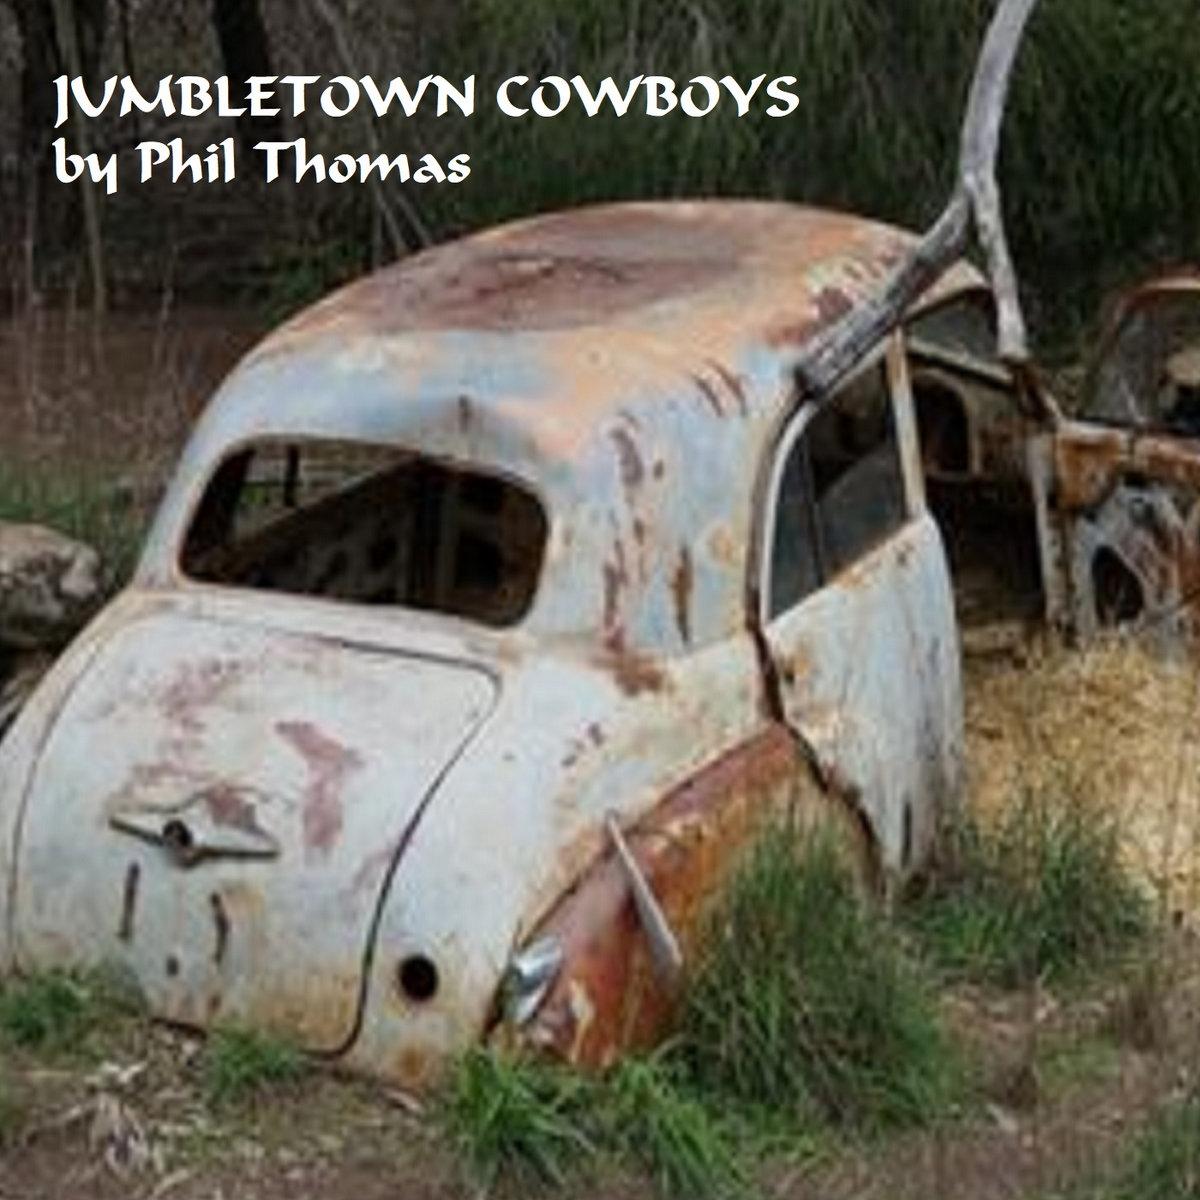 Jumbletown Cowboys by Phil Thomas